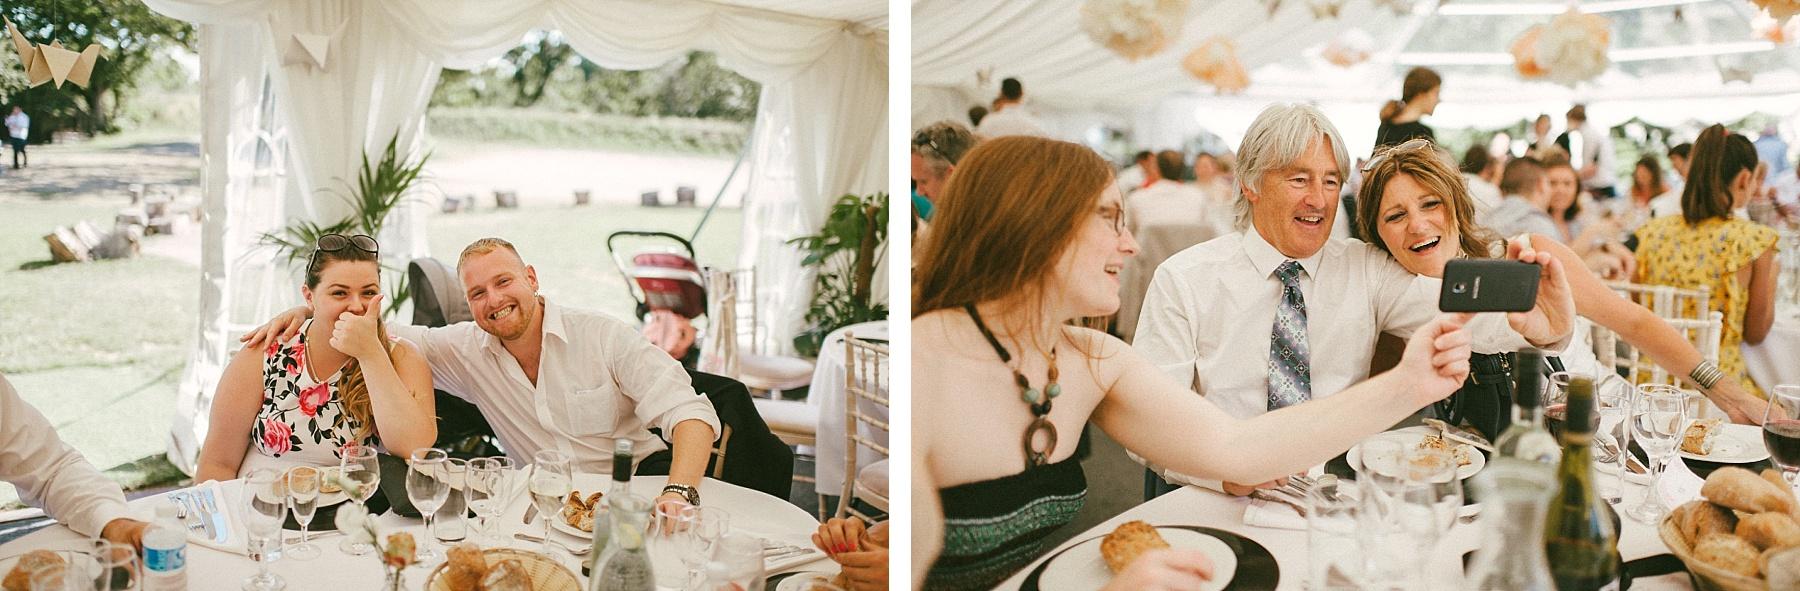 Outdoor wedding England